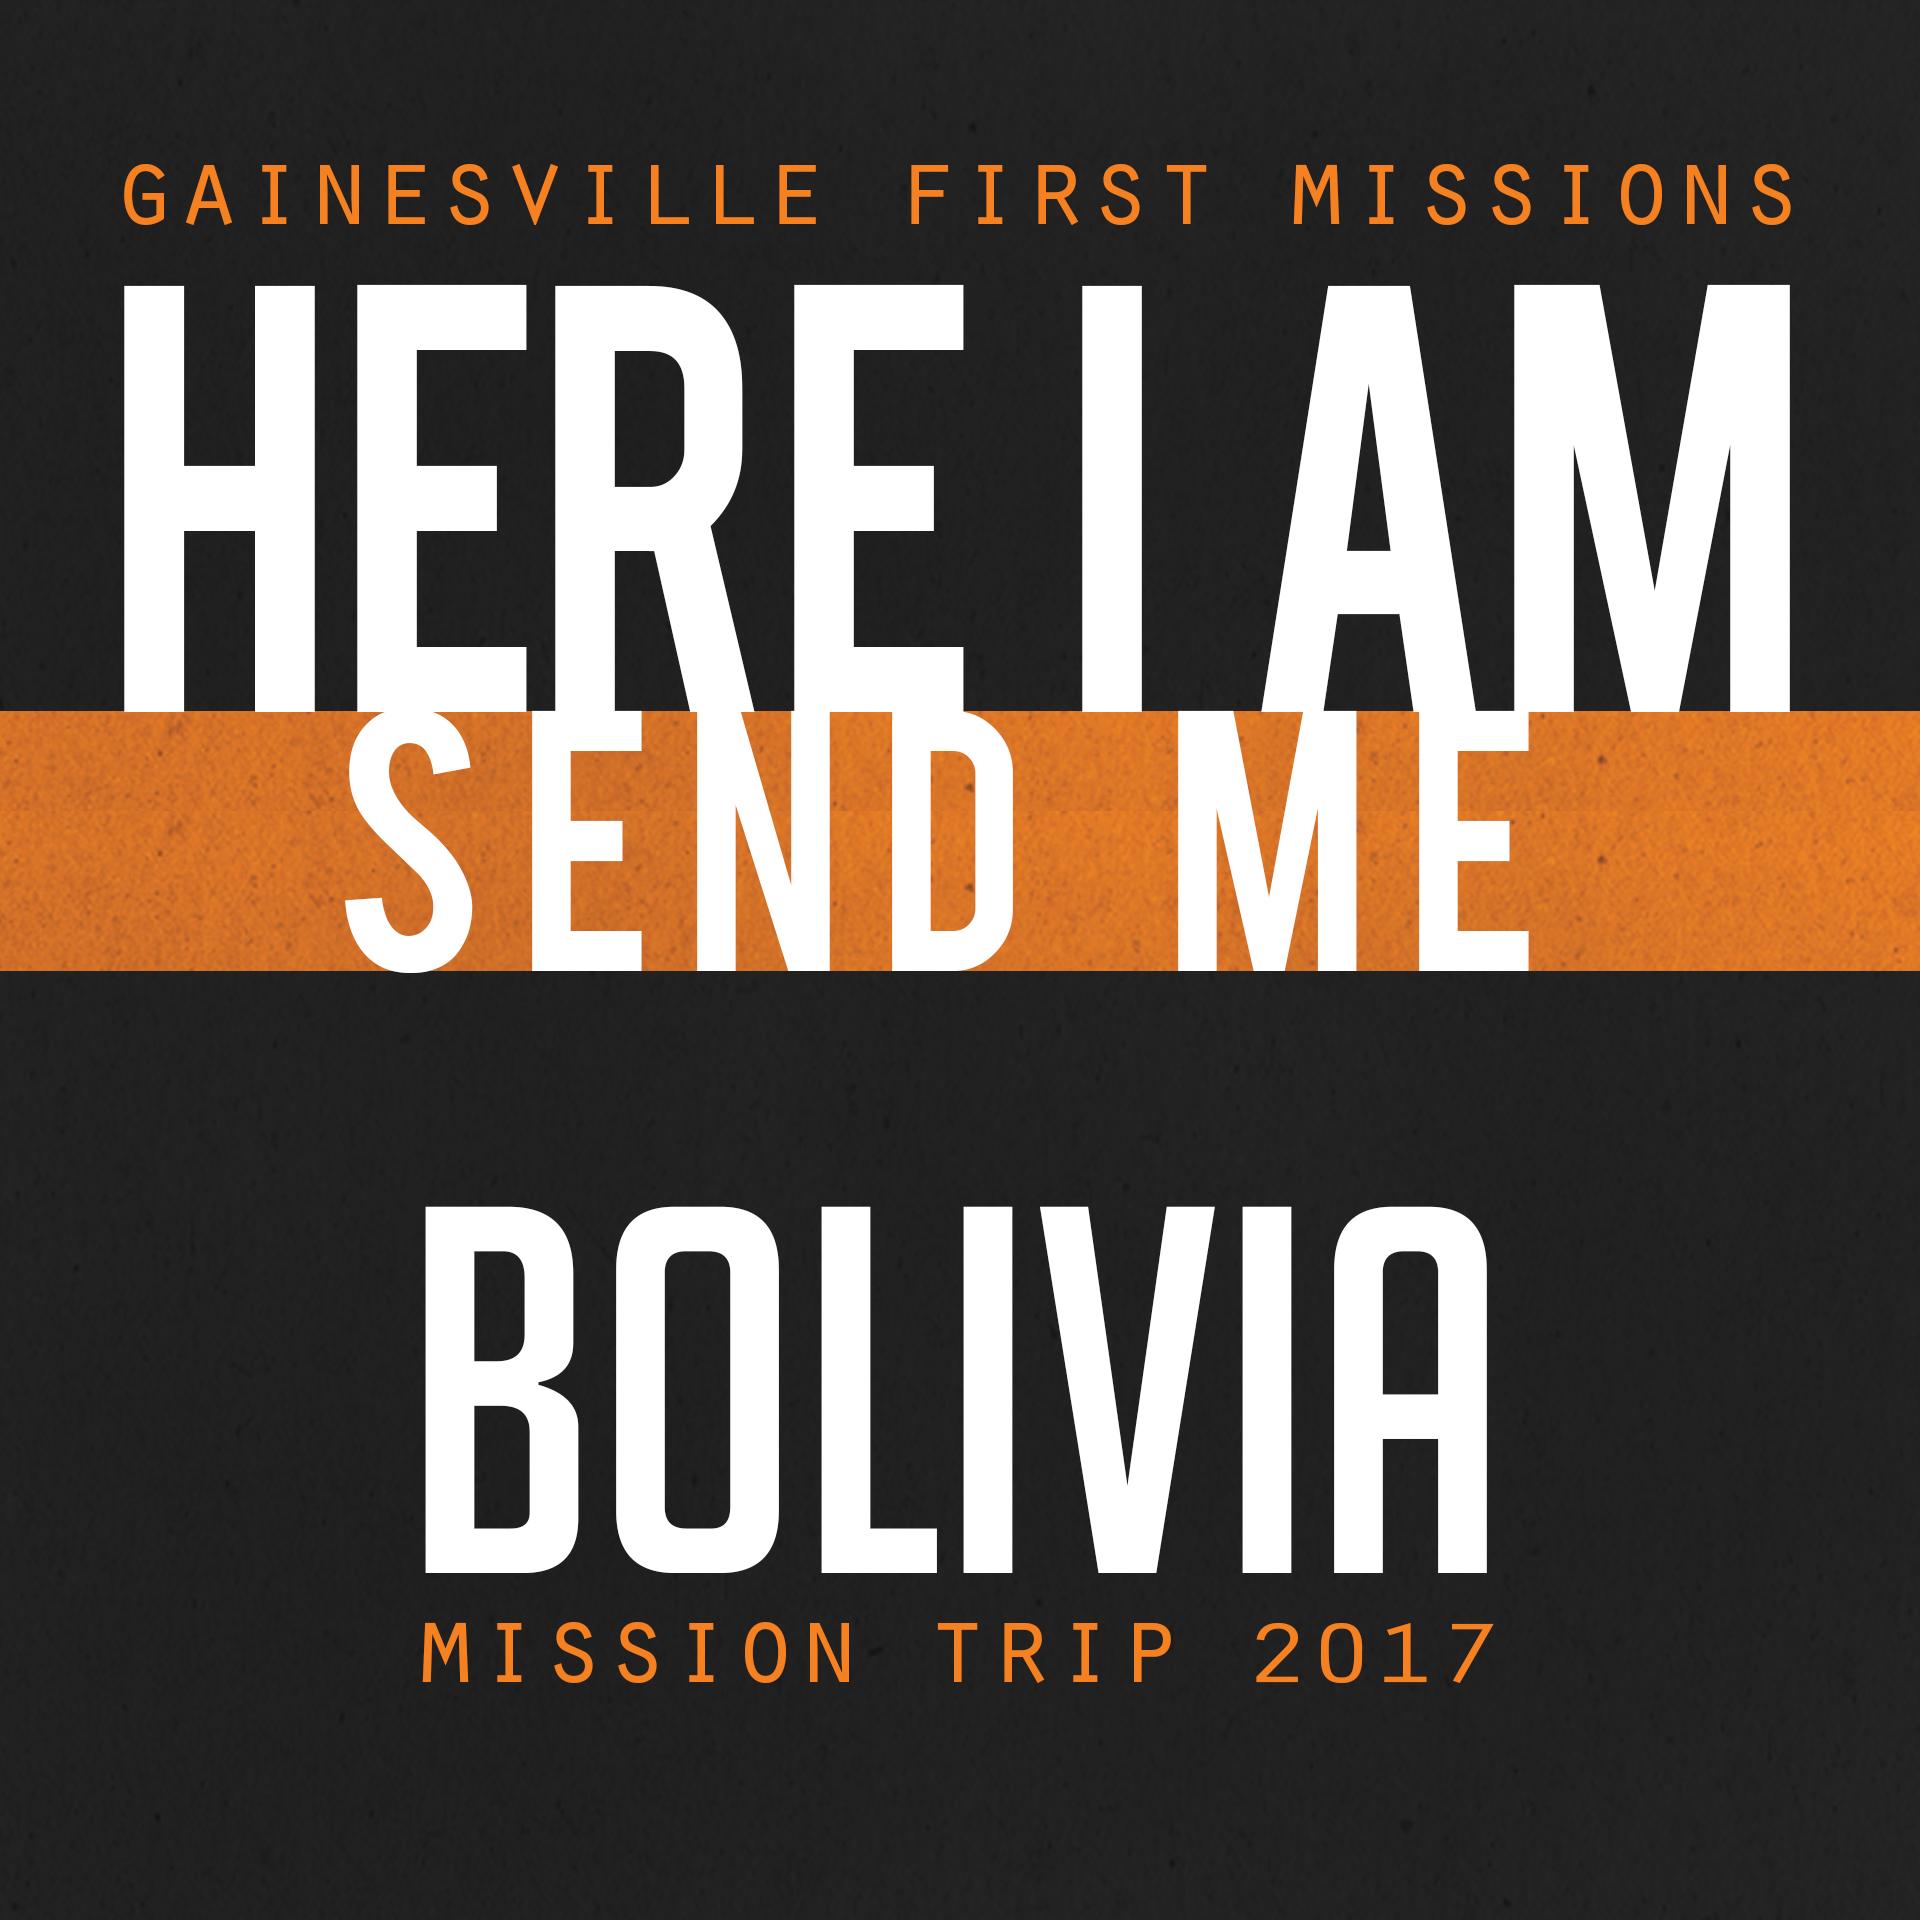 art_missions_bolivia.jpg